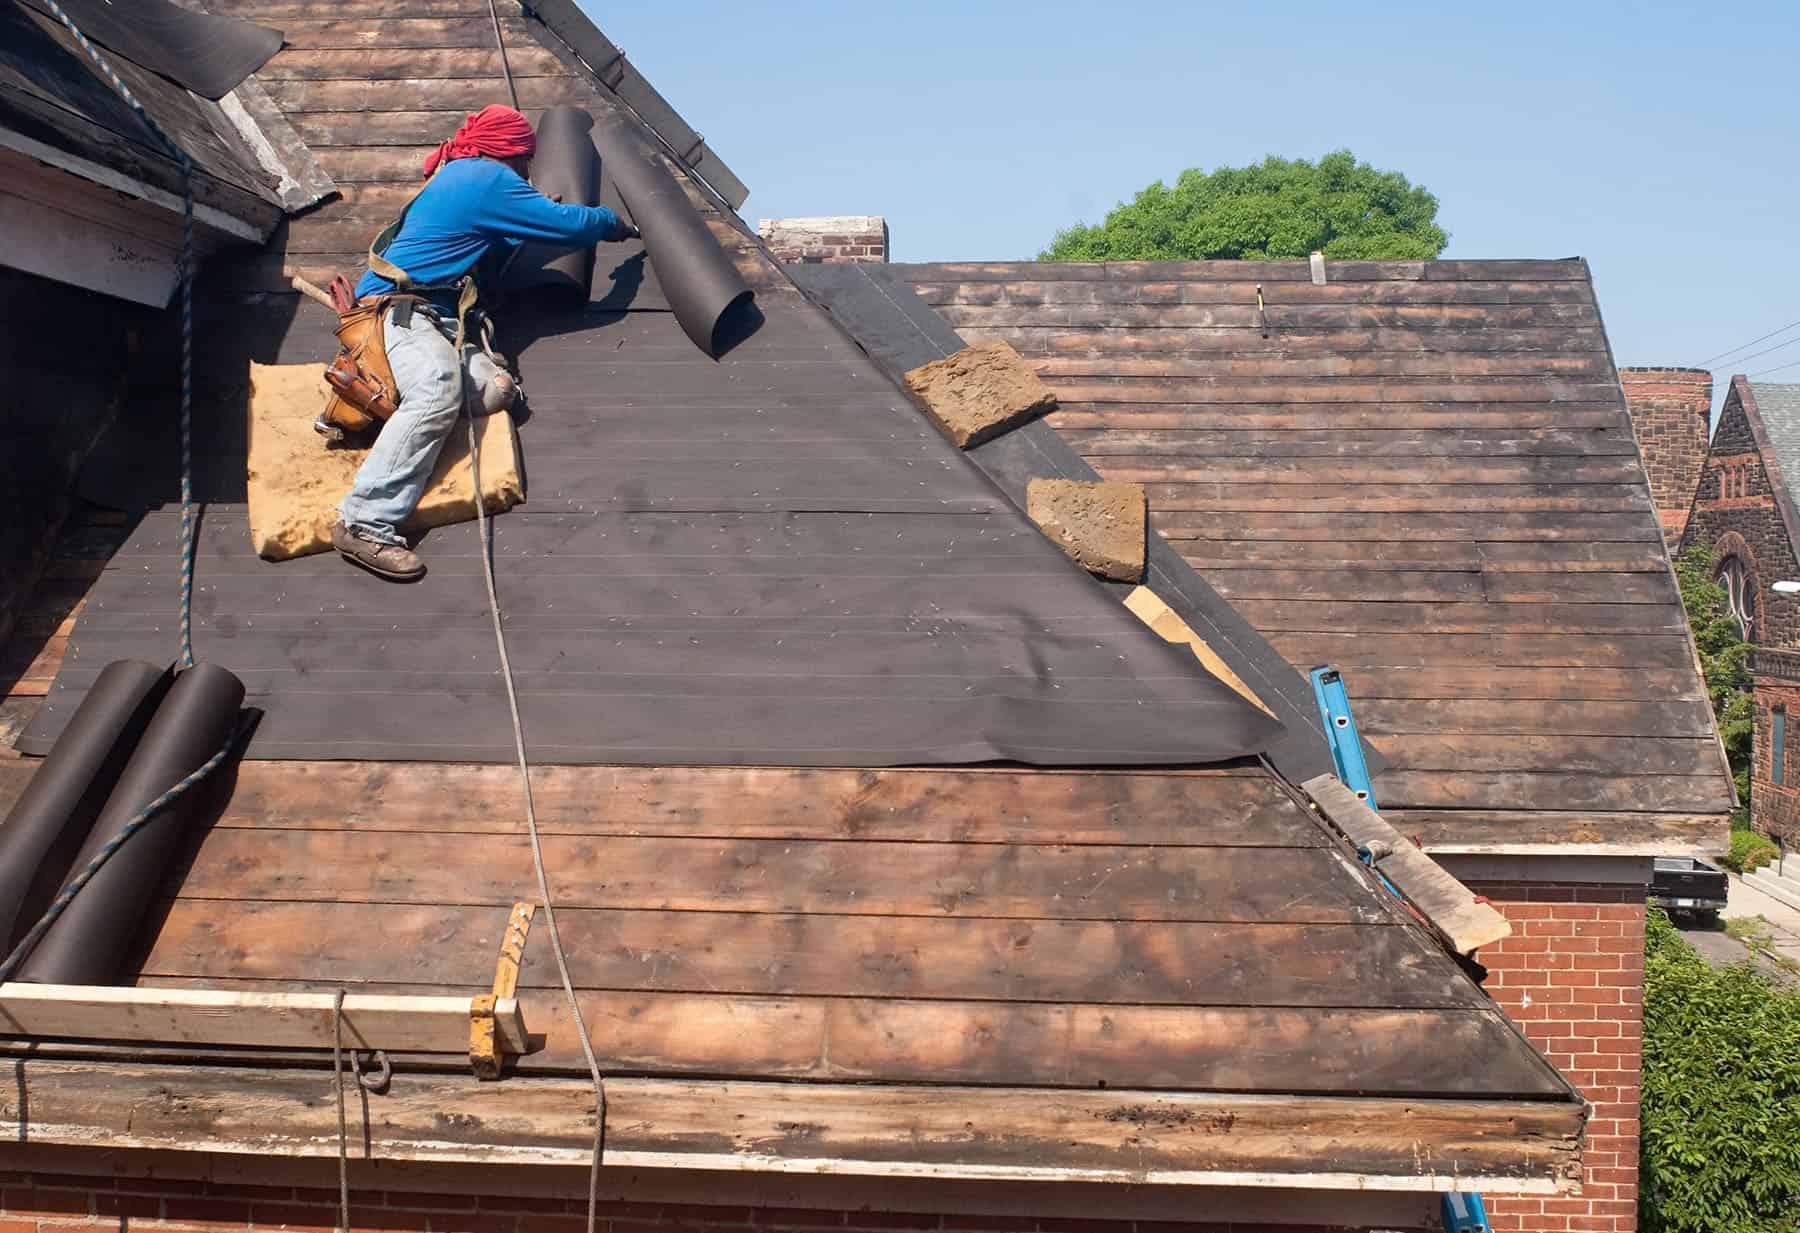 how long should a roof last